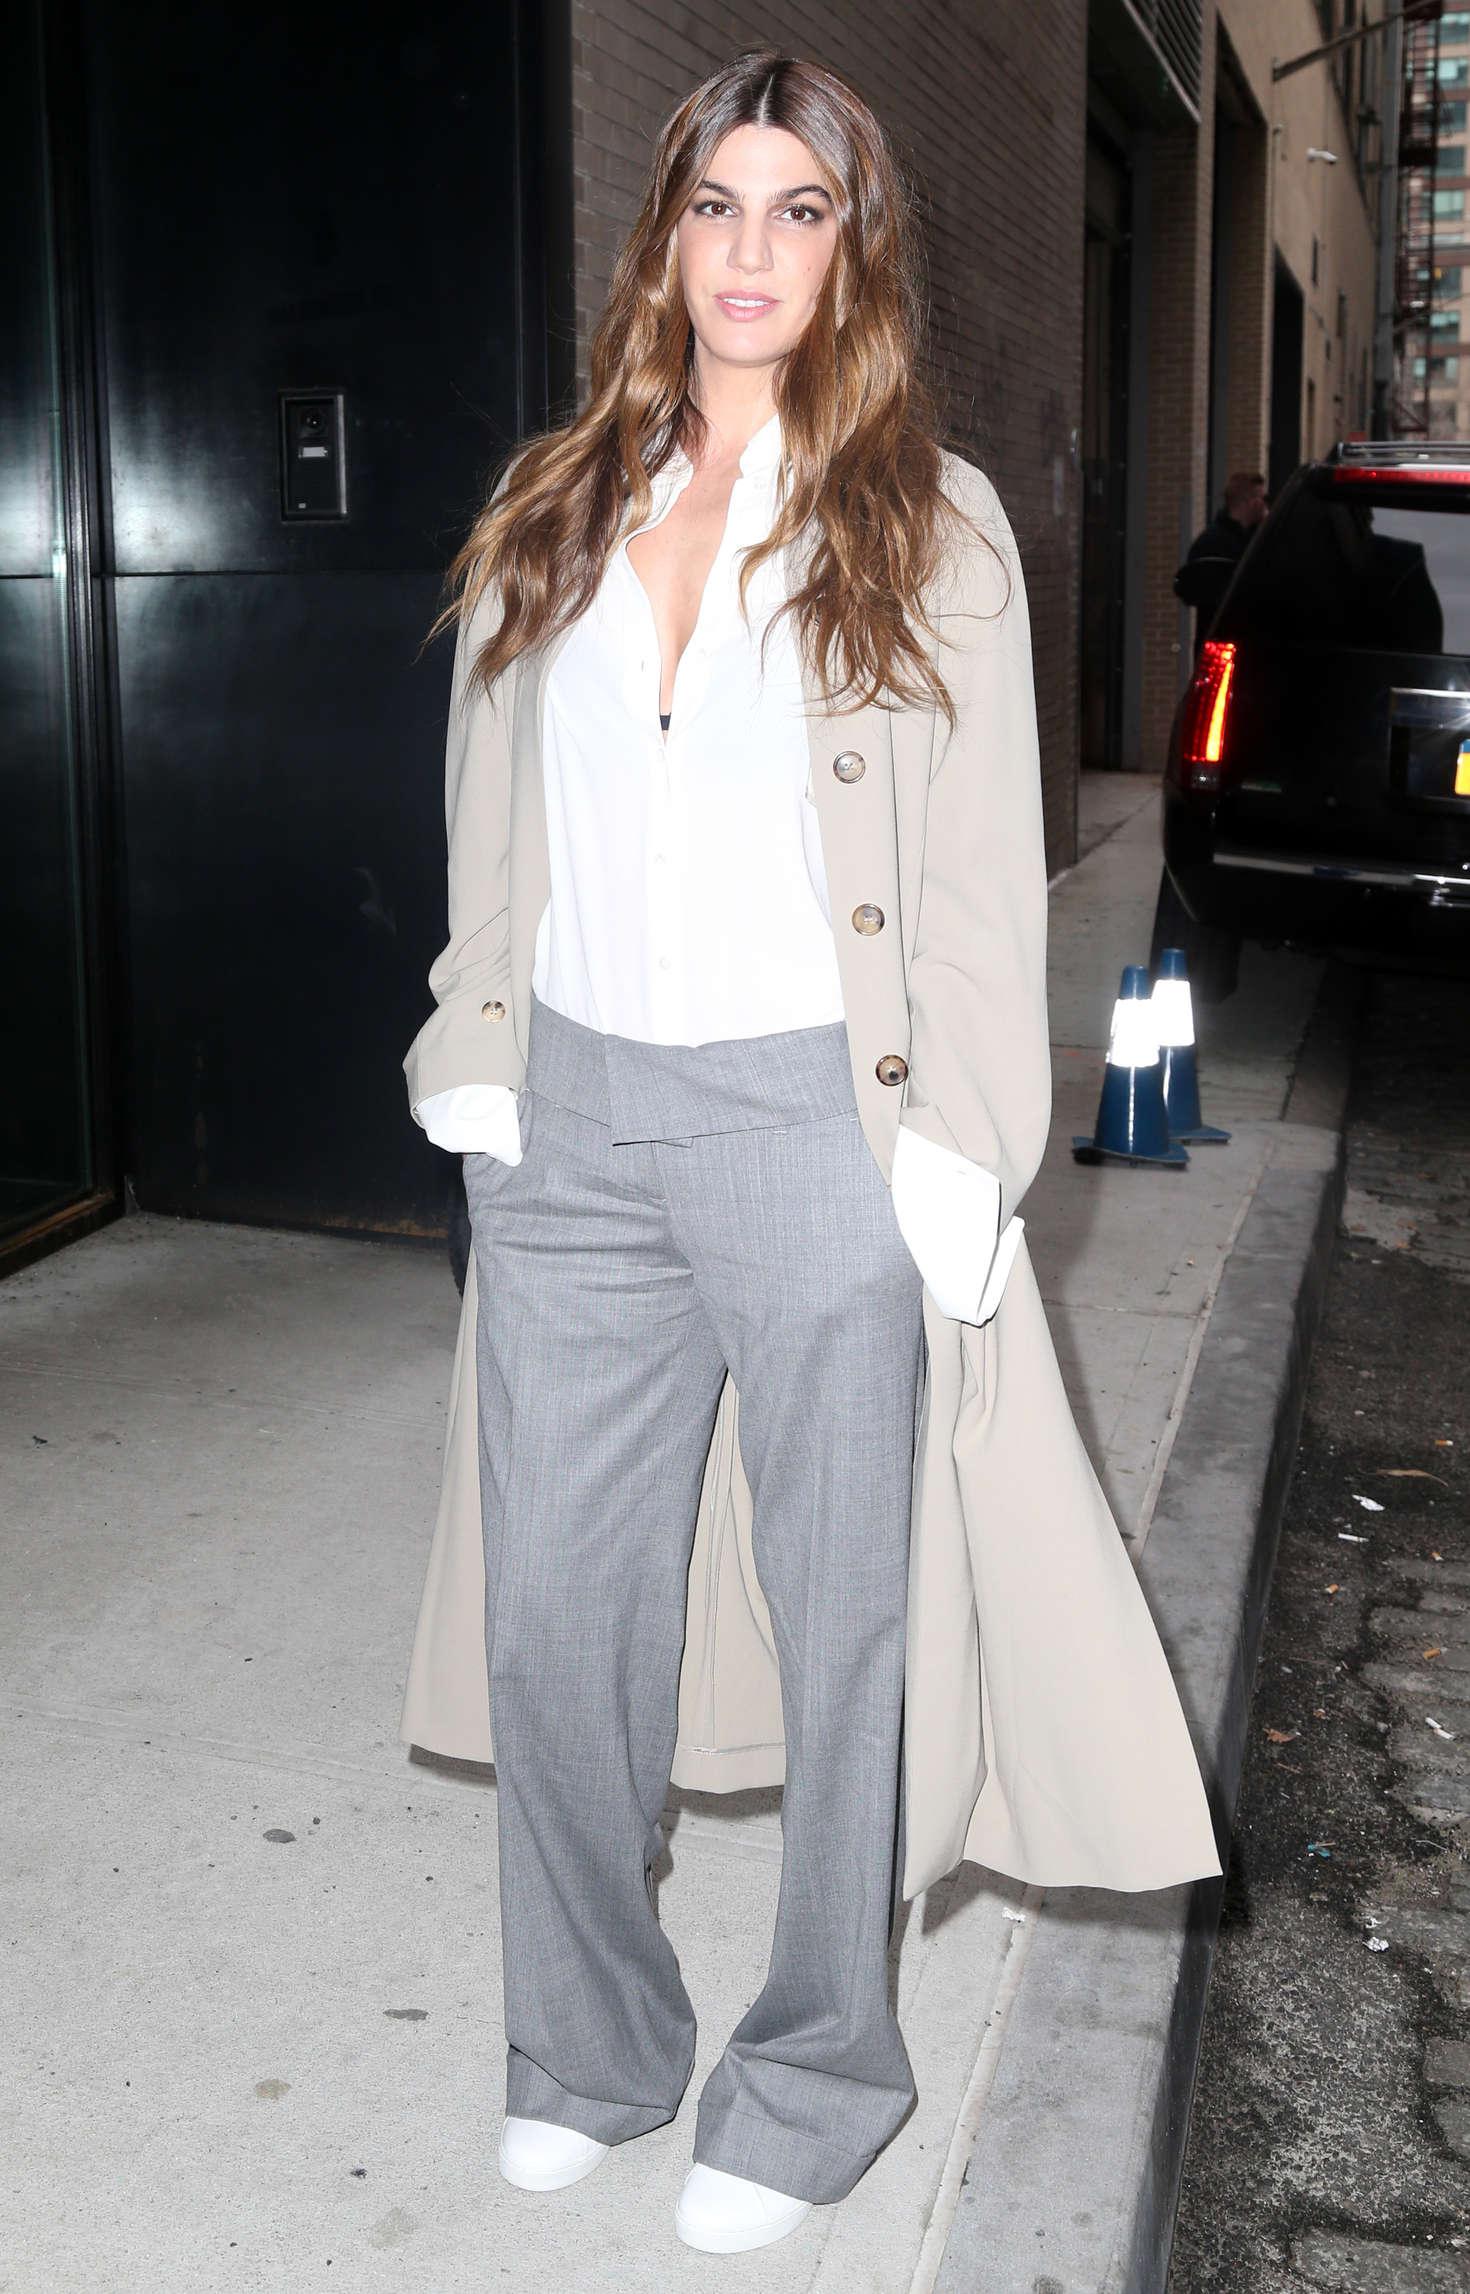 Bianca Brandolini d'Adda - Arrives at the Michael Kors 2016 Fashion Show in NYC